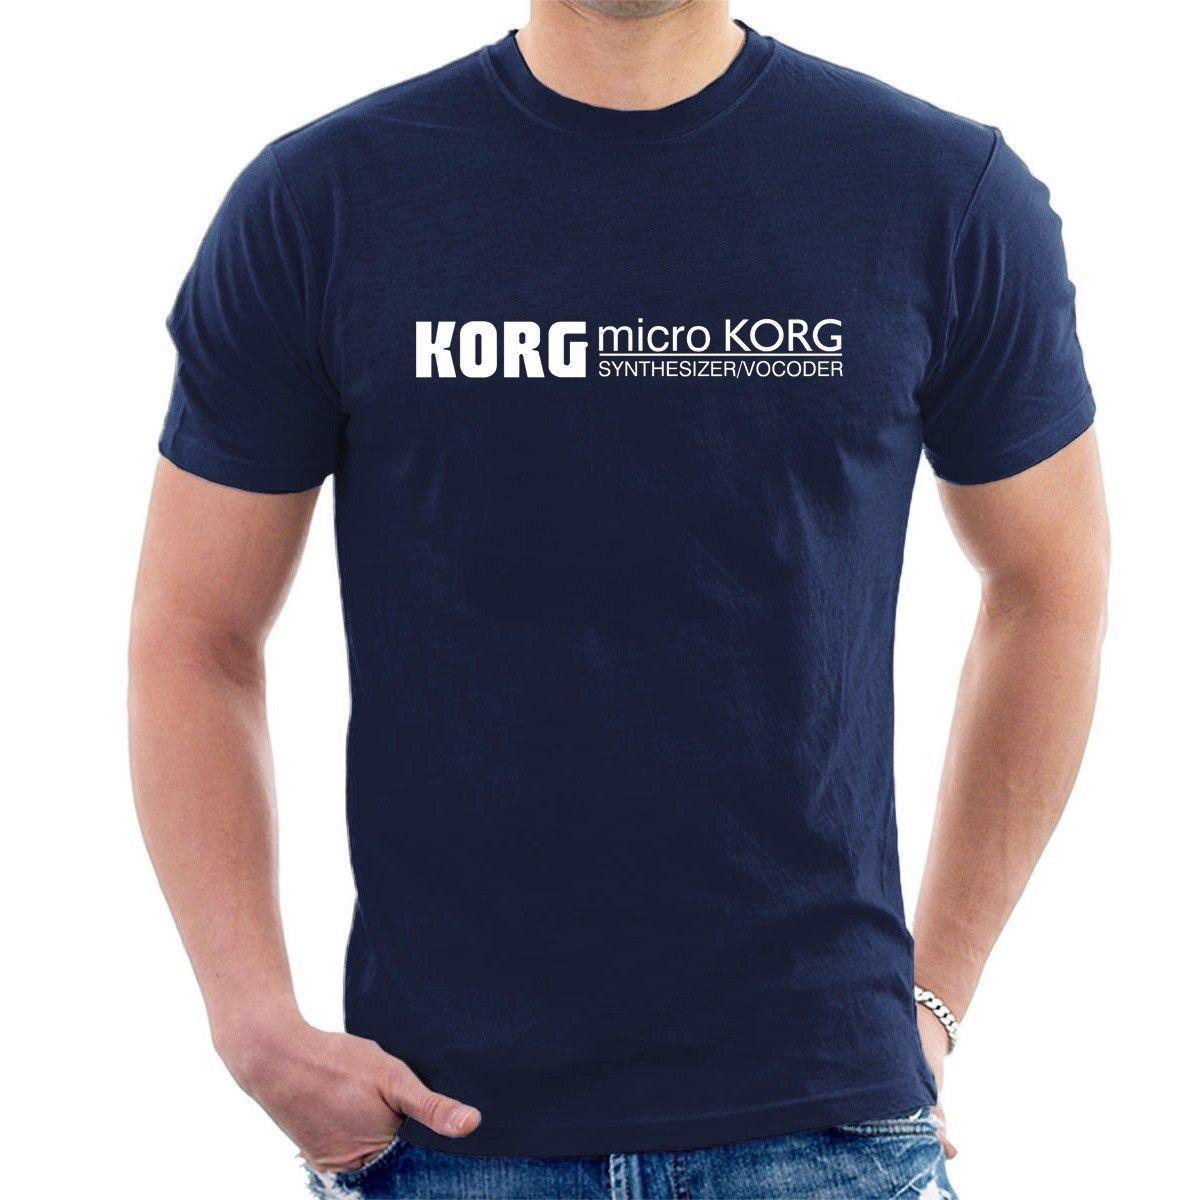 Korg MicroKORG T-SHIRT Inspired Synthesizer vocoder MEN WOMEN KIDS SIZES  S15 Funny free